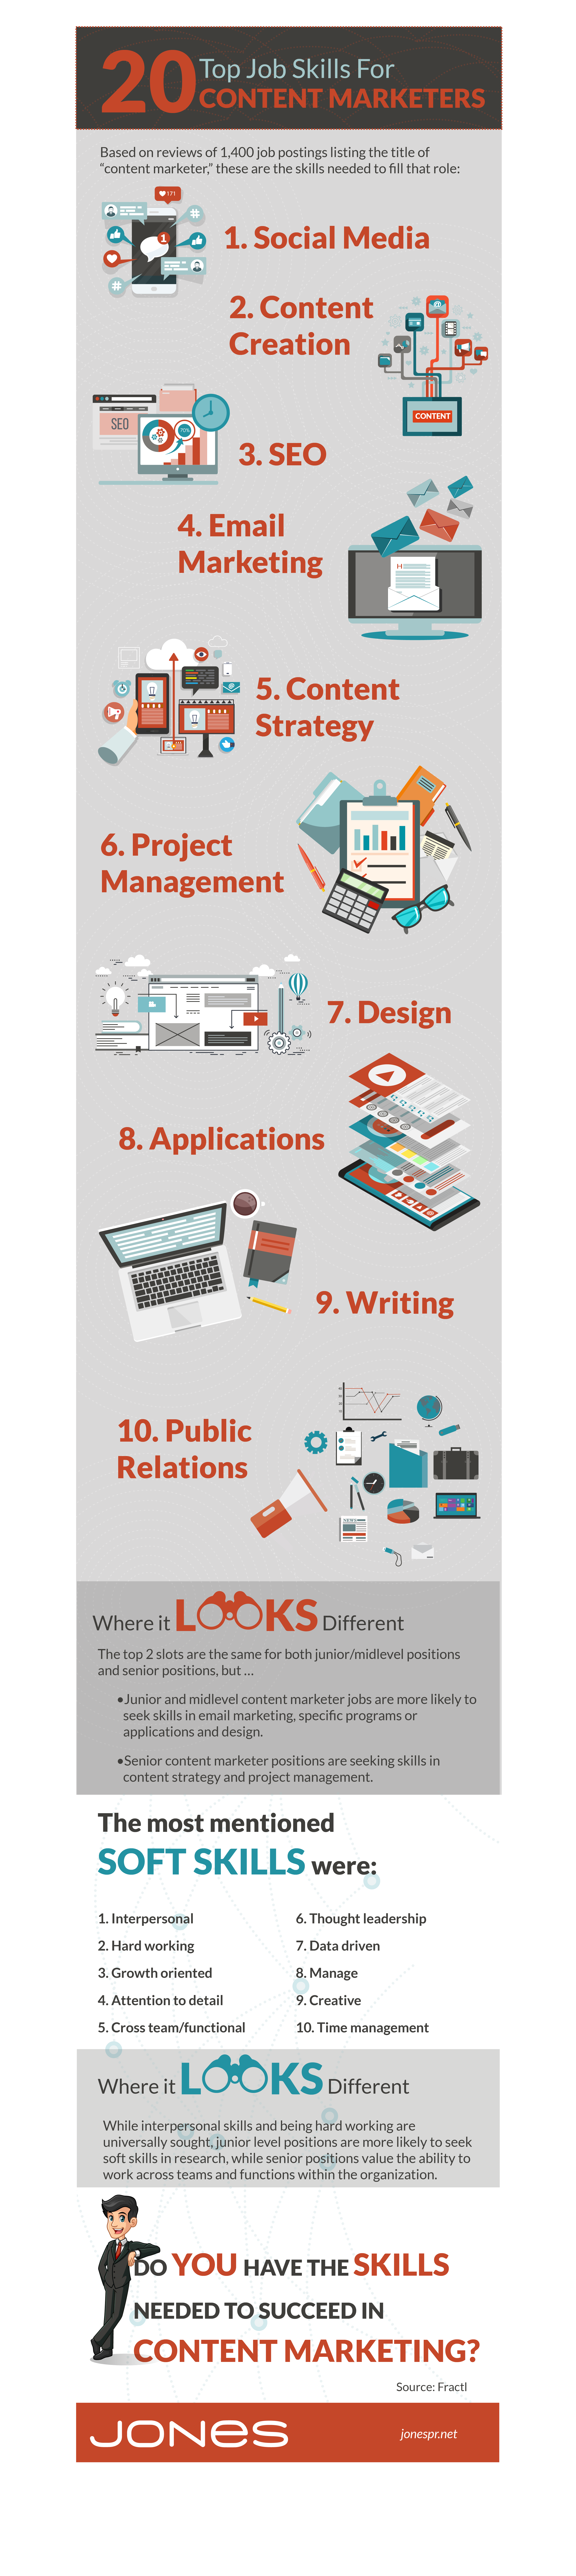 JONES-infographic-content-marketing-job-skills